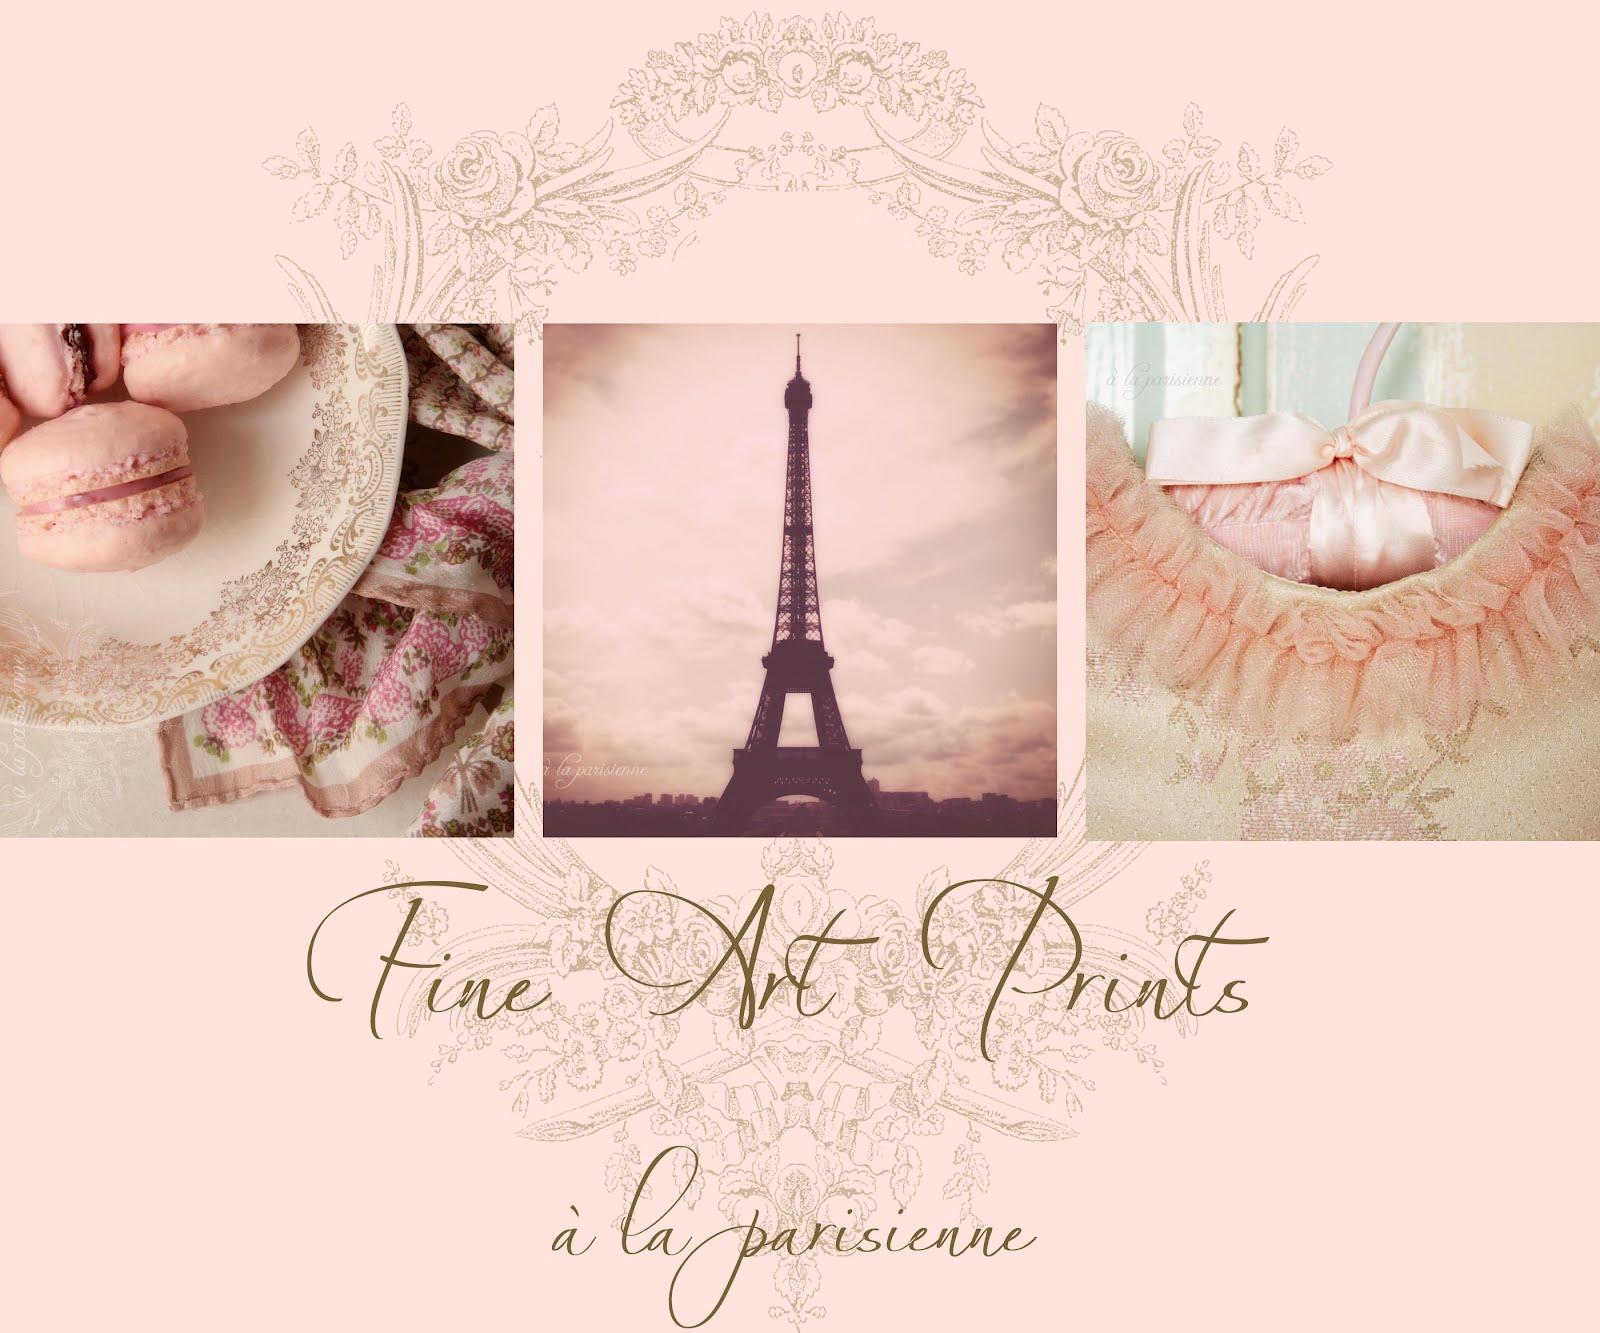 http://1.bp.blogspot.com/-217ASs-RFsk/T0F7Ywf-ICI/AAAAAAAADT4/TS9cuFhQ-AE/s1600/Macarons.Eiffel.Antoinette%2B%25C3%25A0%2Bla%2Bparisienne.jpg